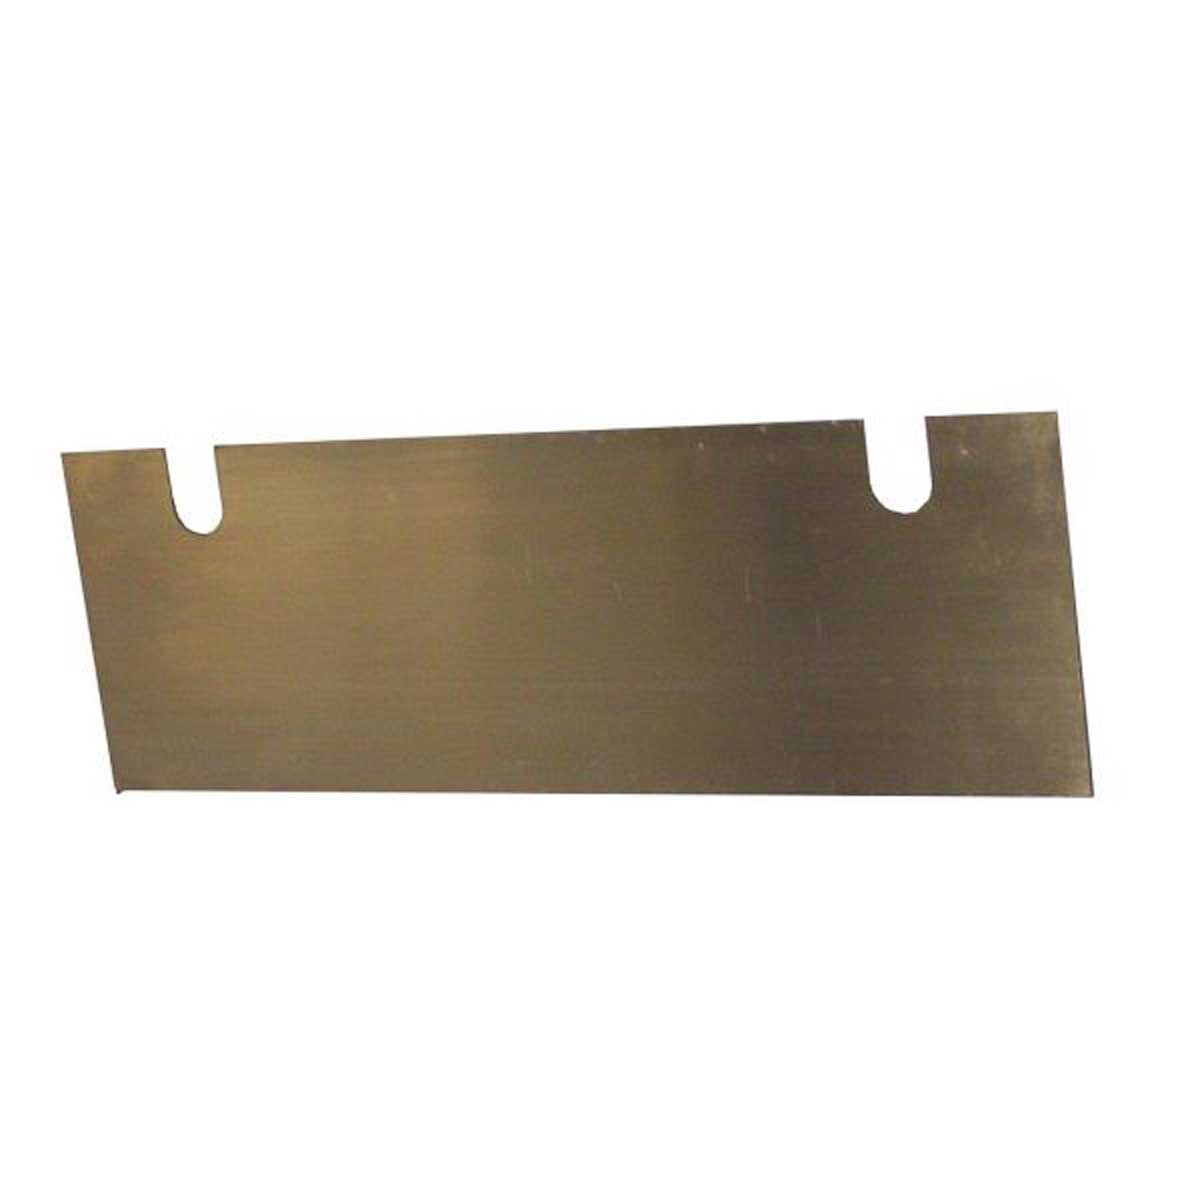 Bartell Standard Scraper Blade